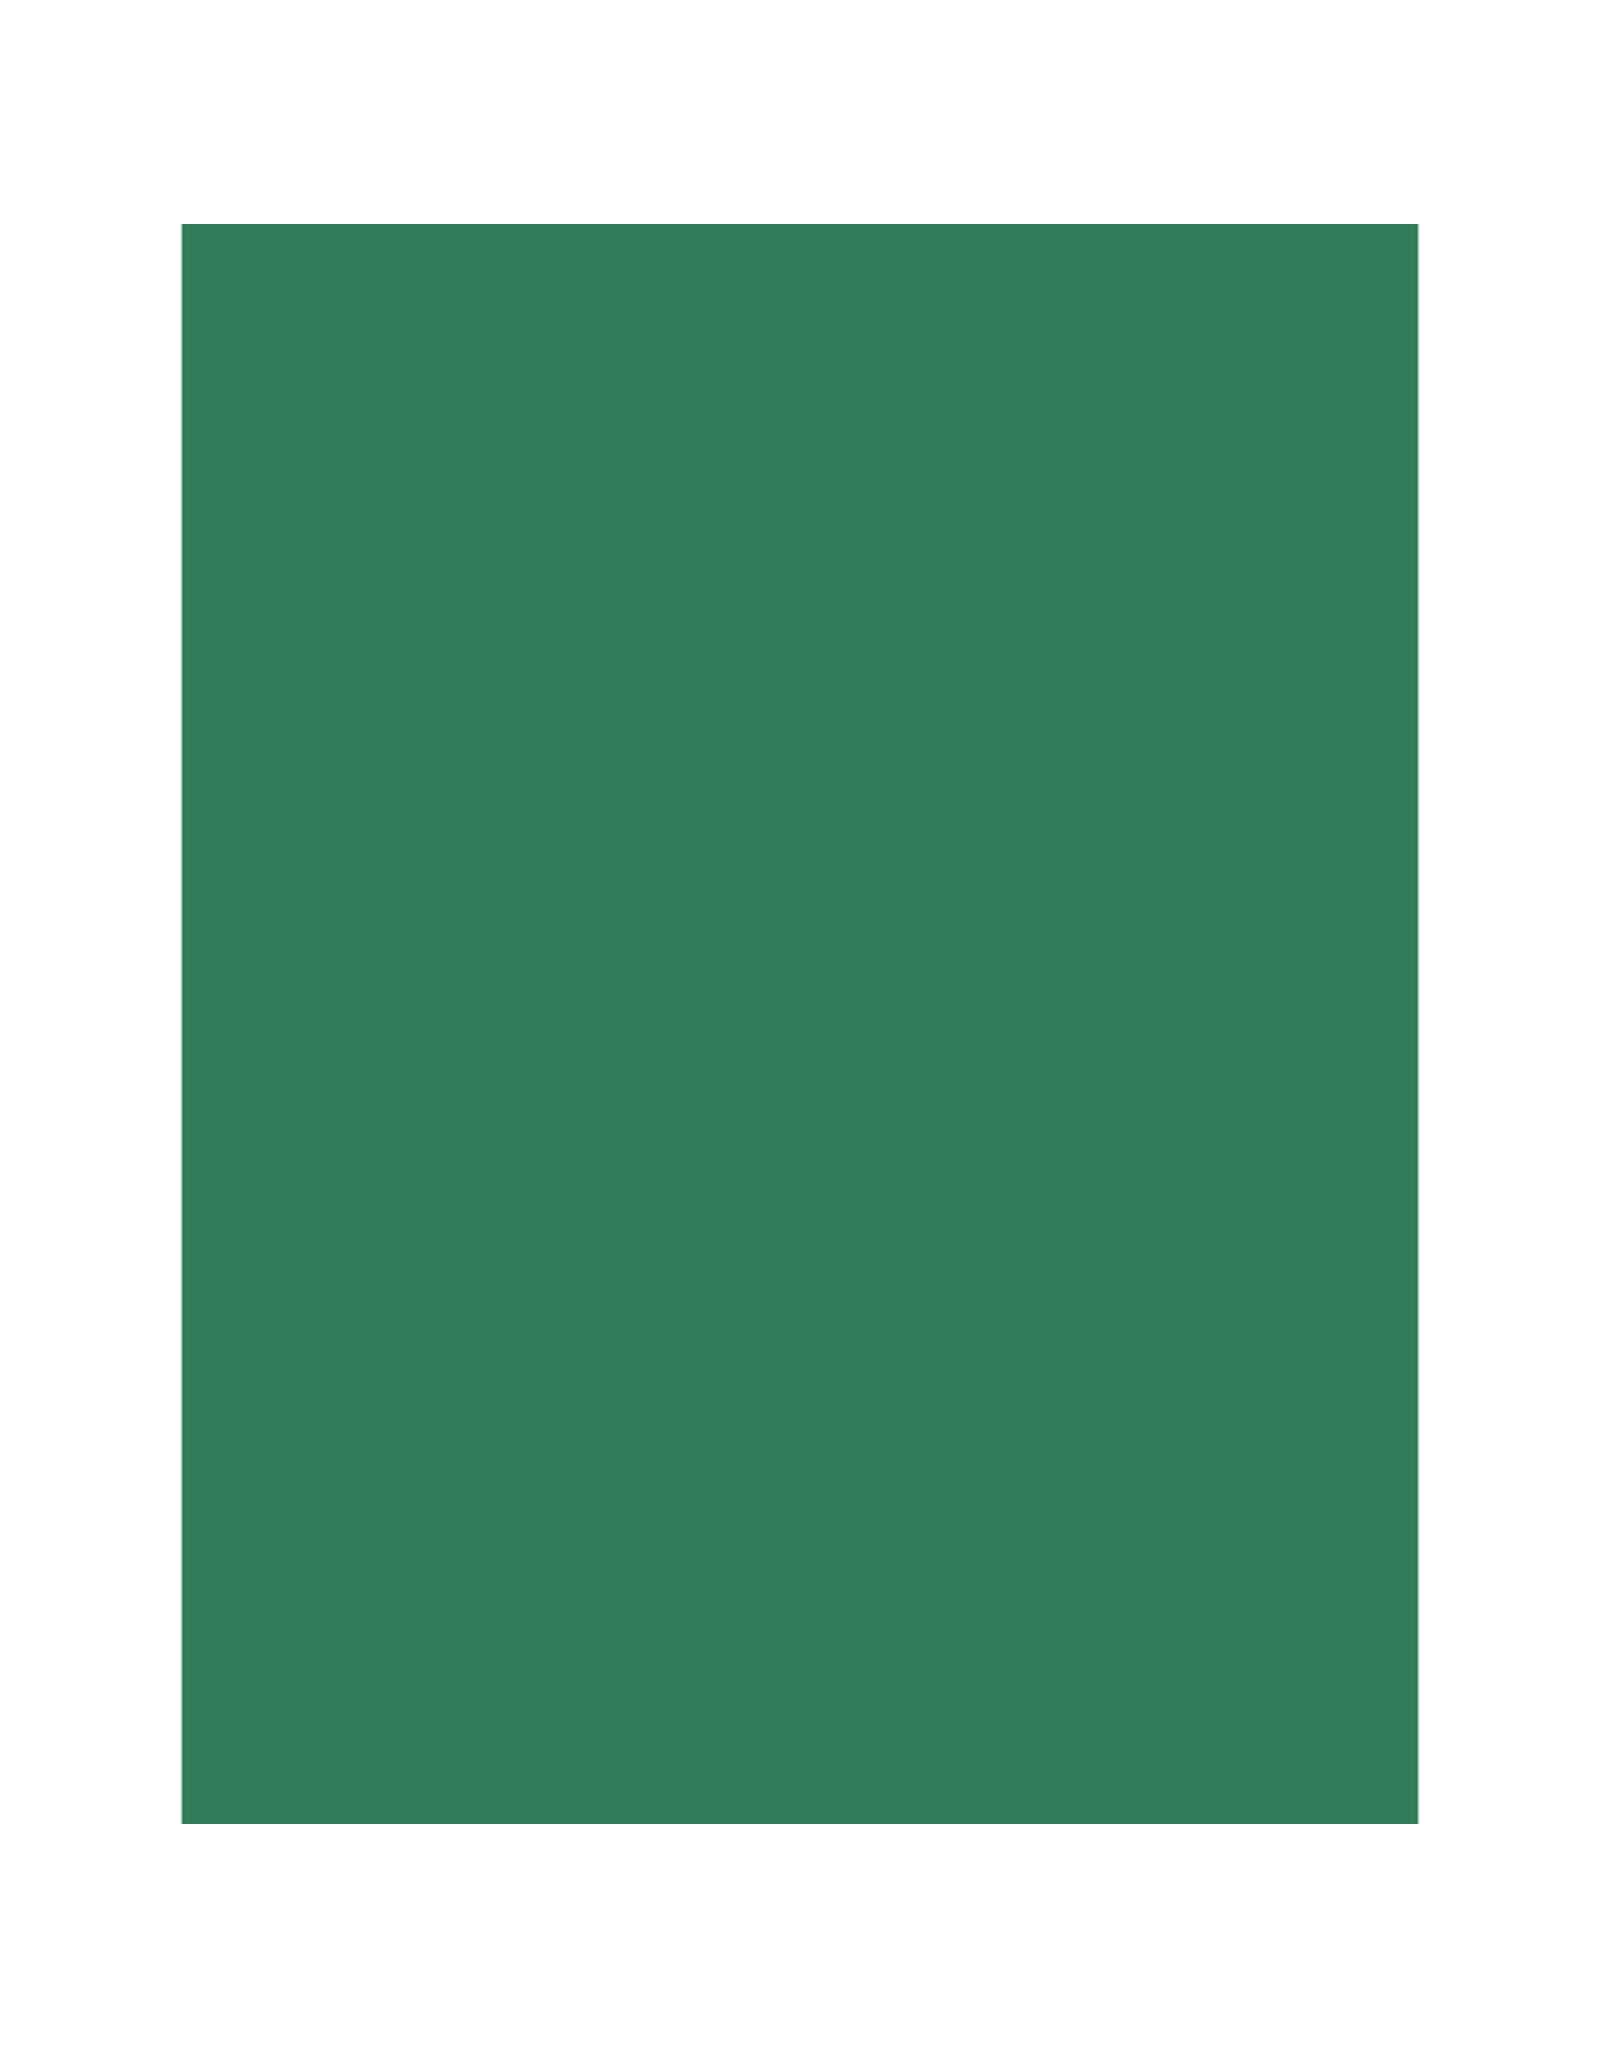 Bazzill Bazzill Card Shoppe 8.5x11 - Evergreen